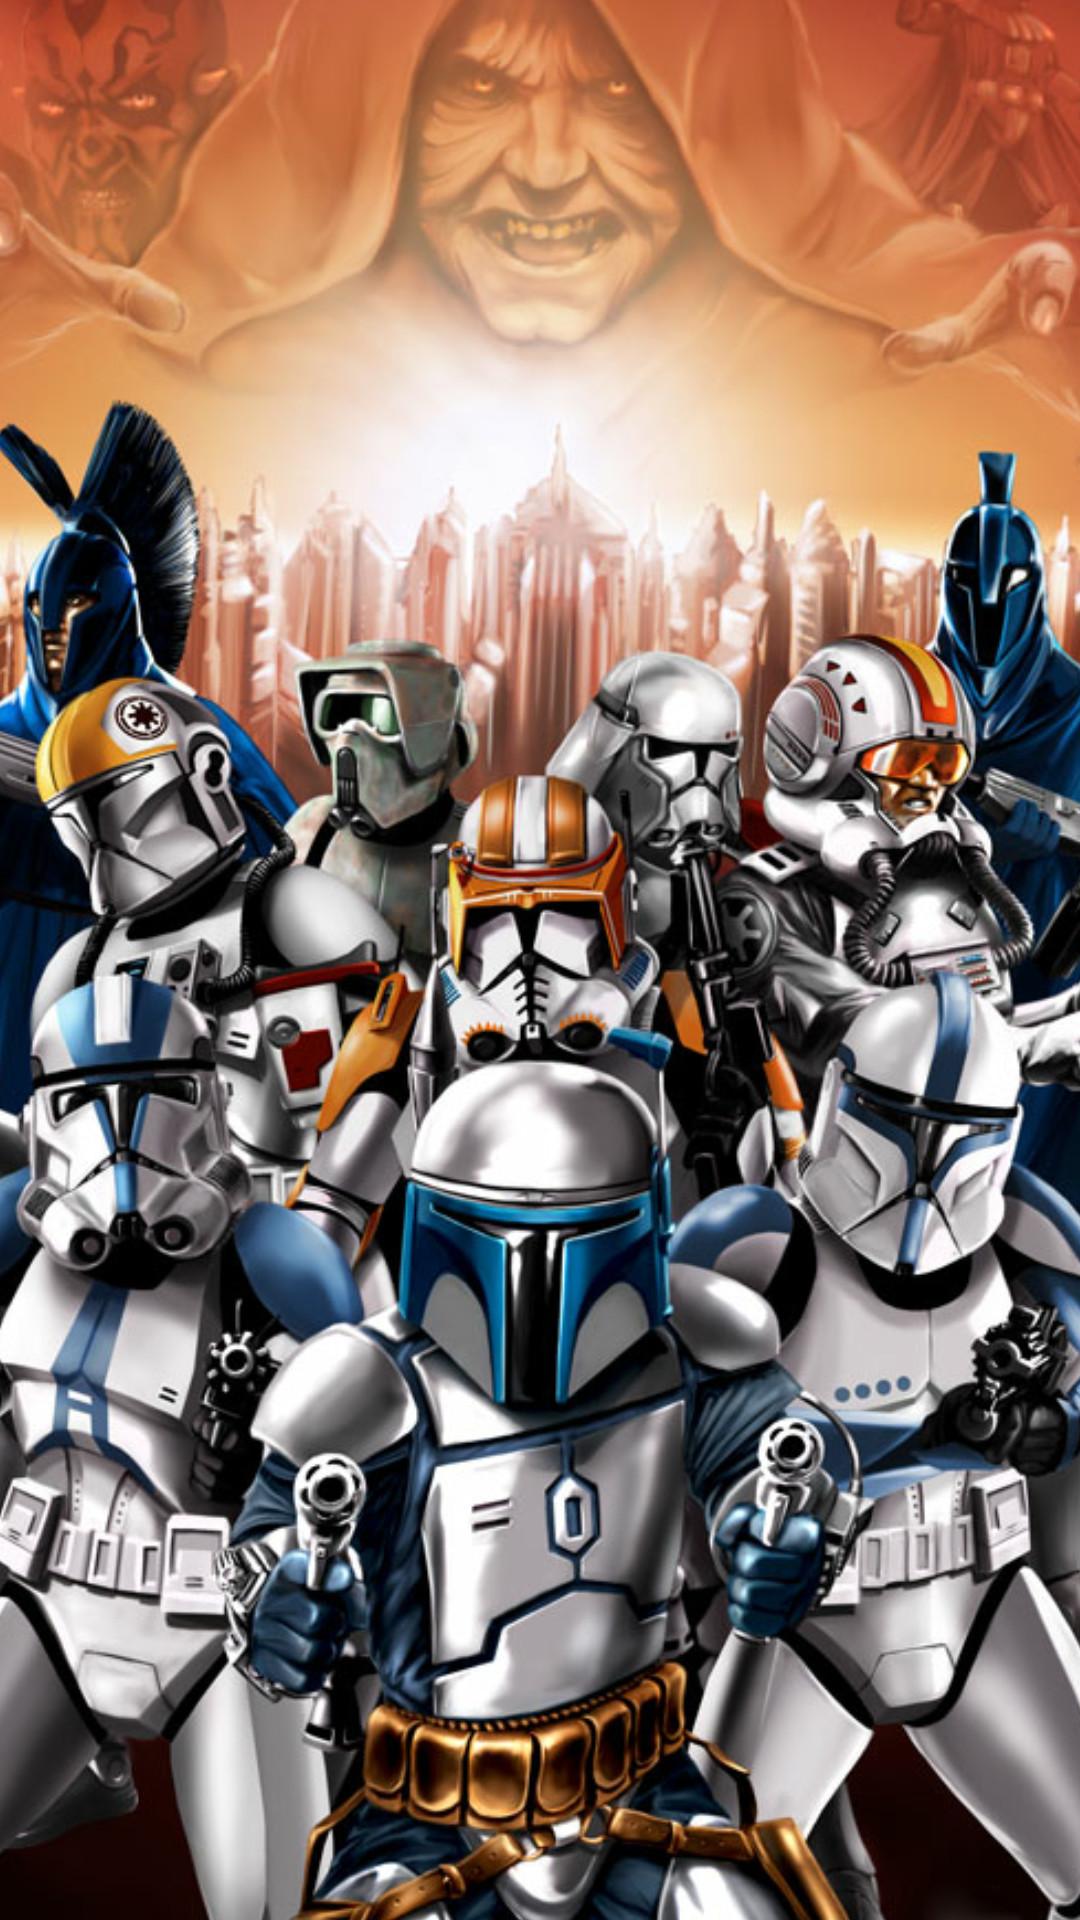 501st Legion From Star Wars 1080x1920 Download Hd Wallpaper Wallpapertip